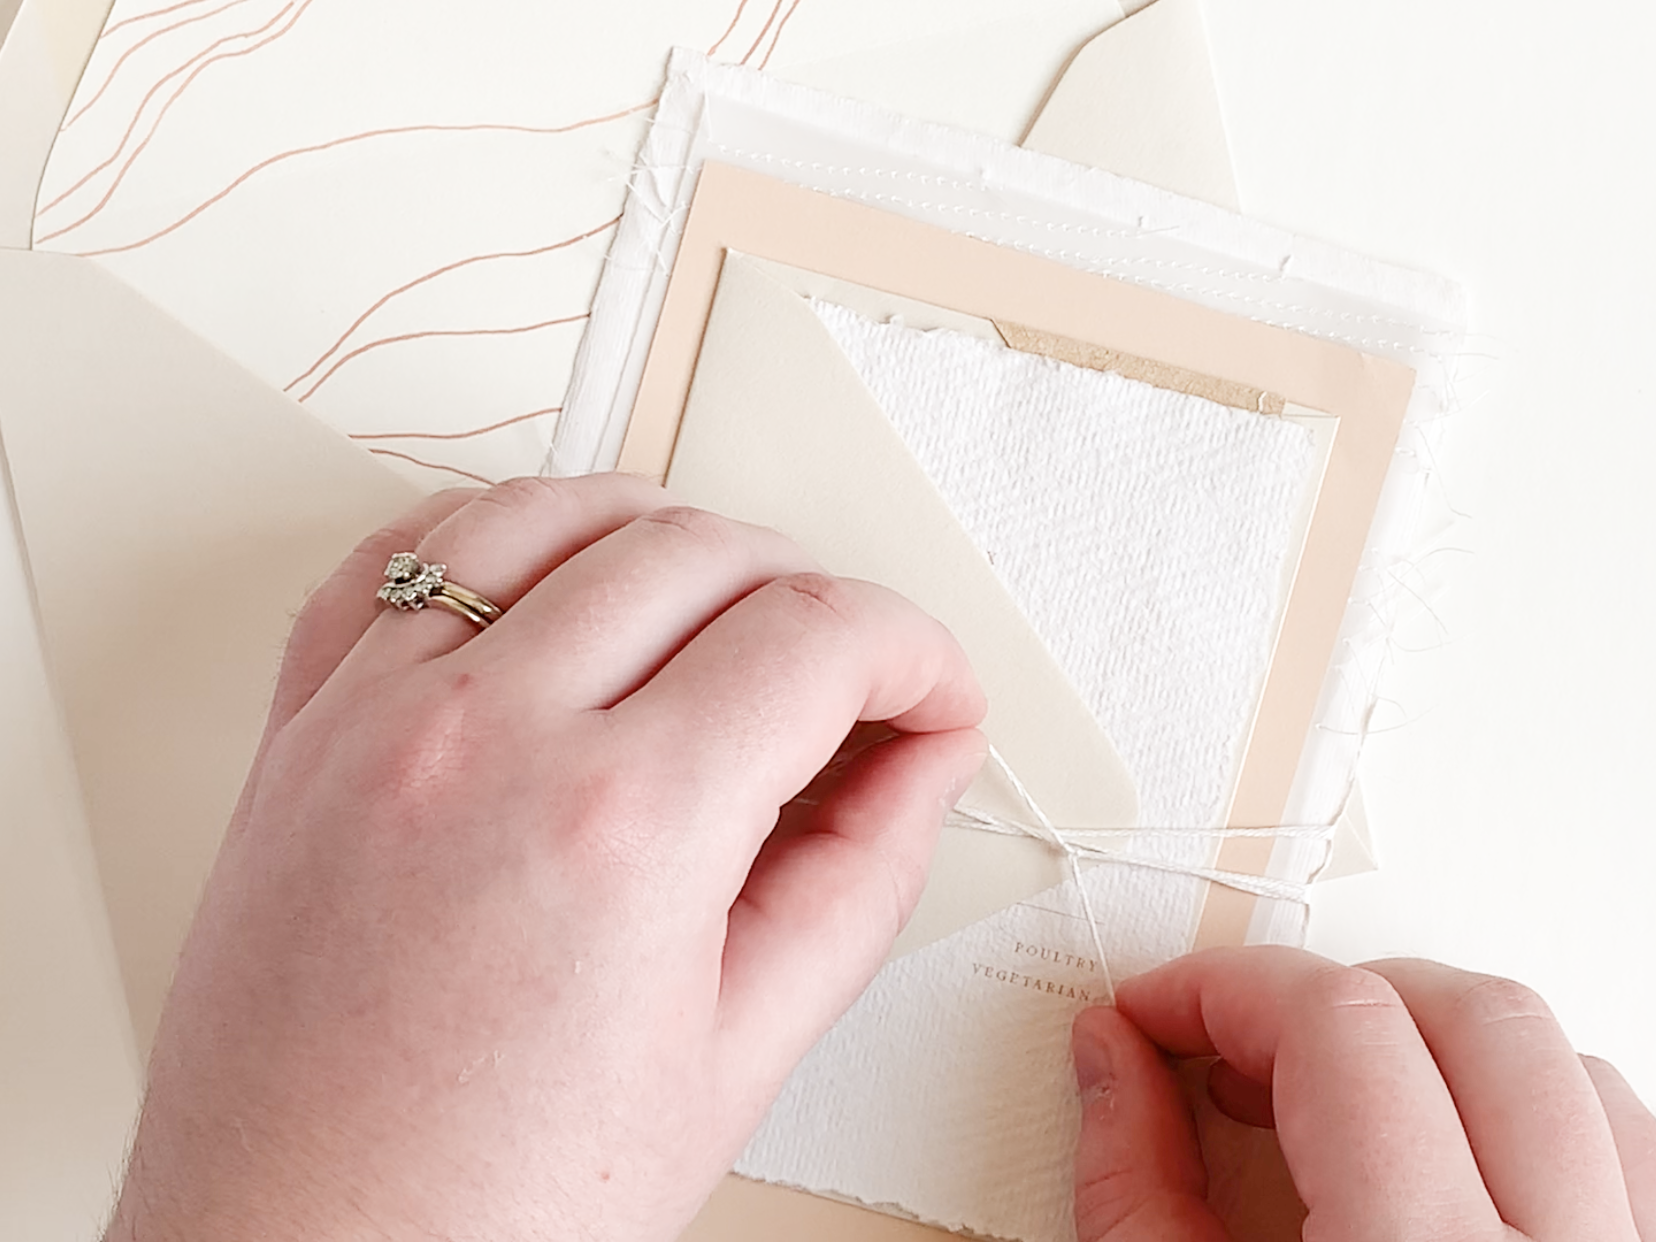 Behind the Scenes: Assembling Wedding Invitations. A behind the scenes look at how we assemble our custom and semi-custom luxury wedding invitations.